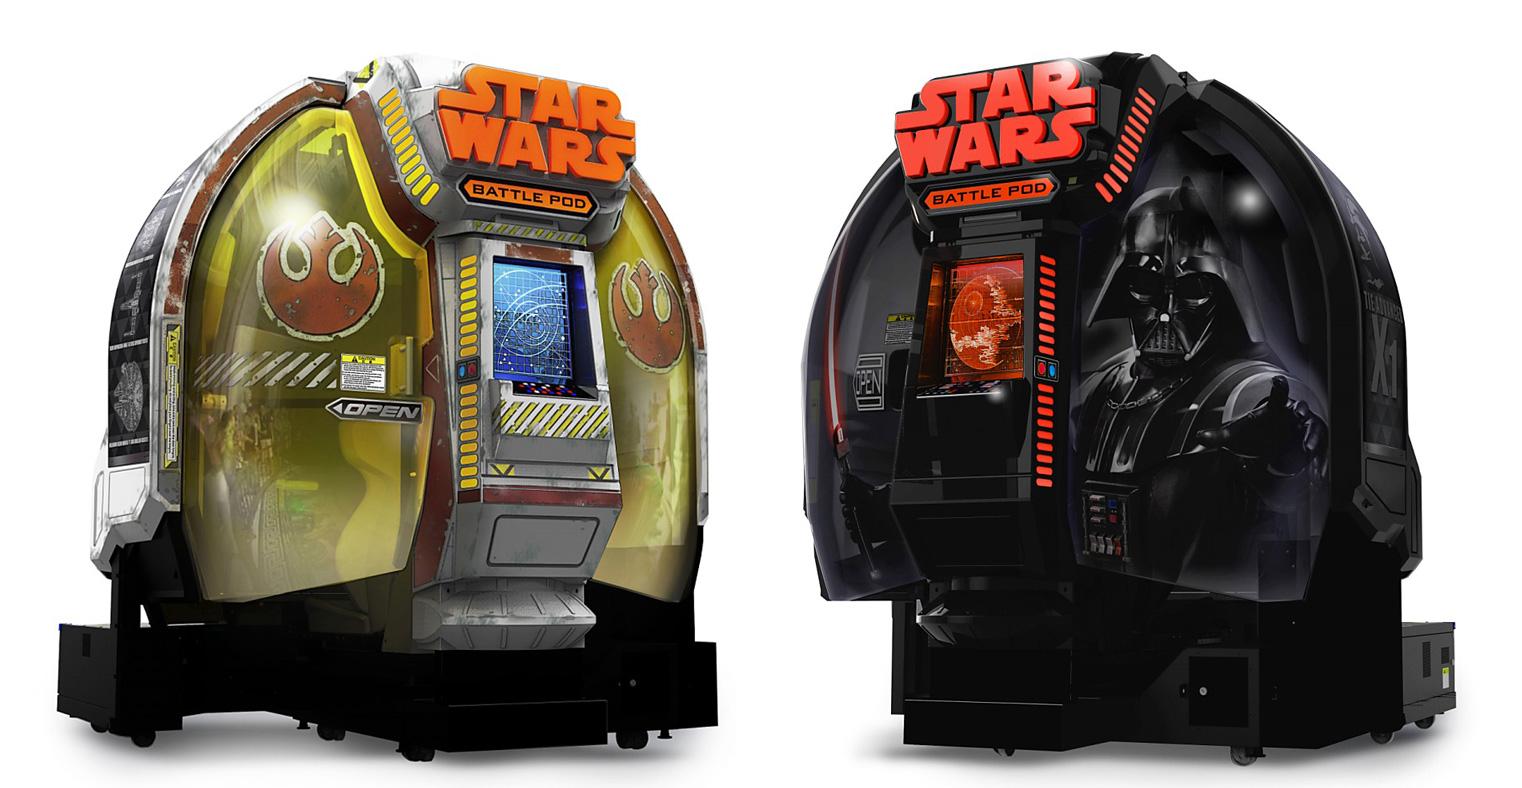 Star Wars: Battle Pod Home Version